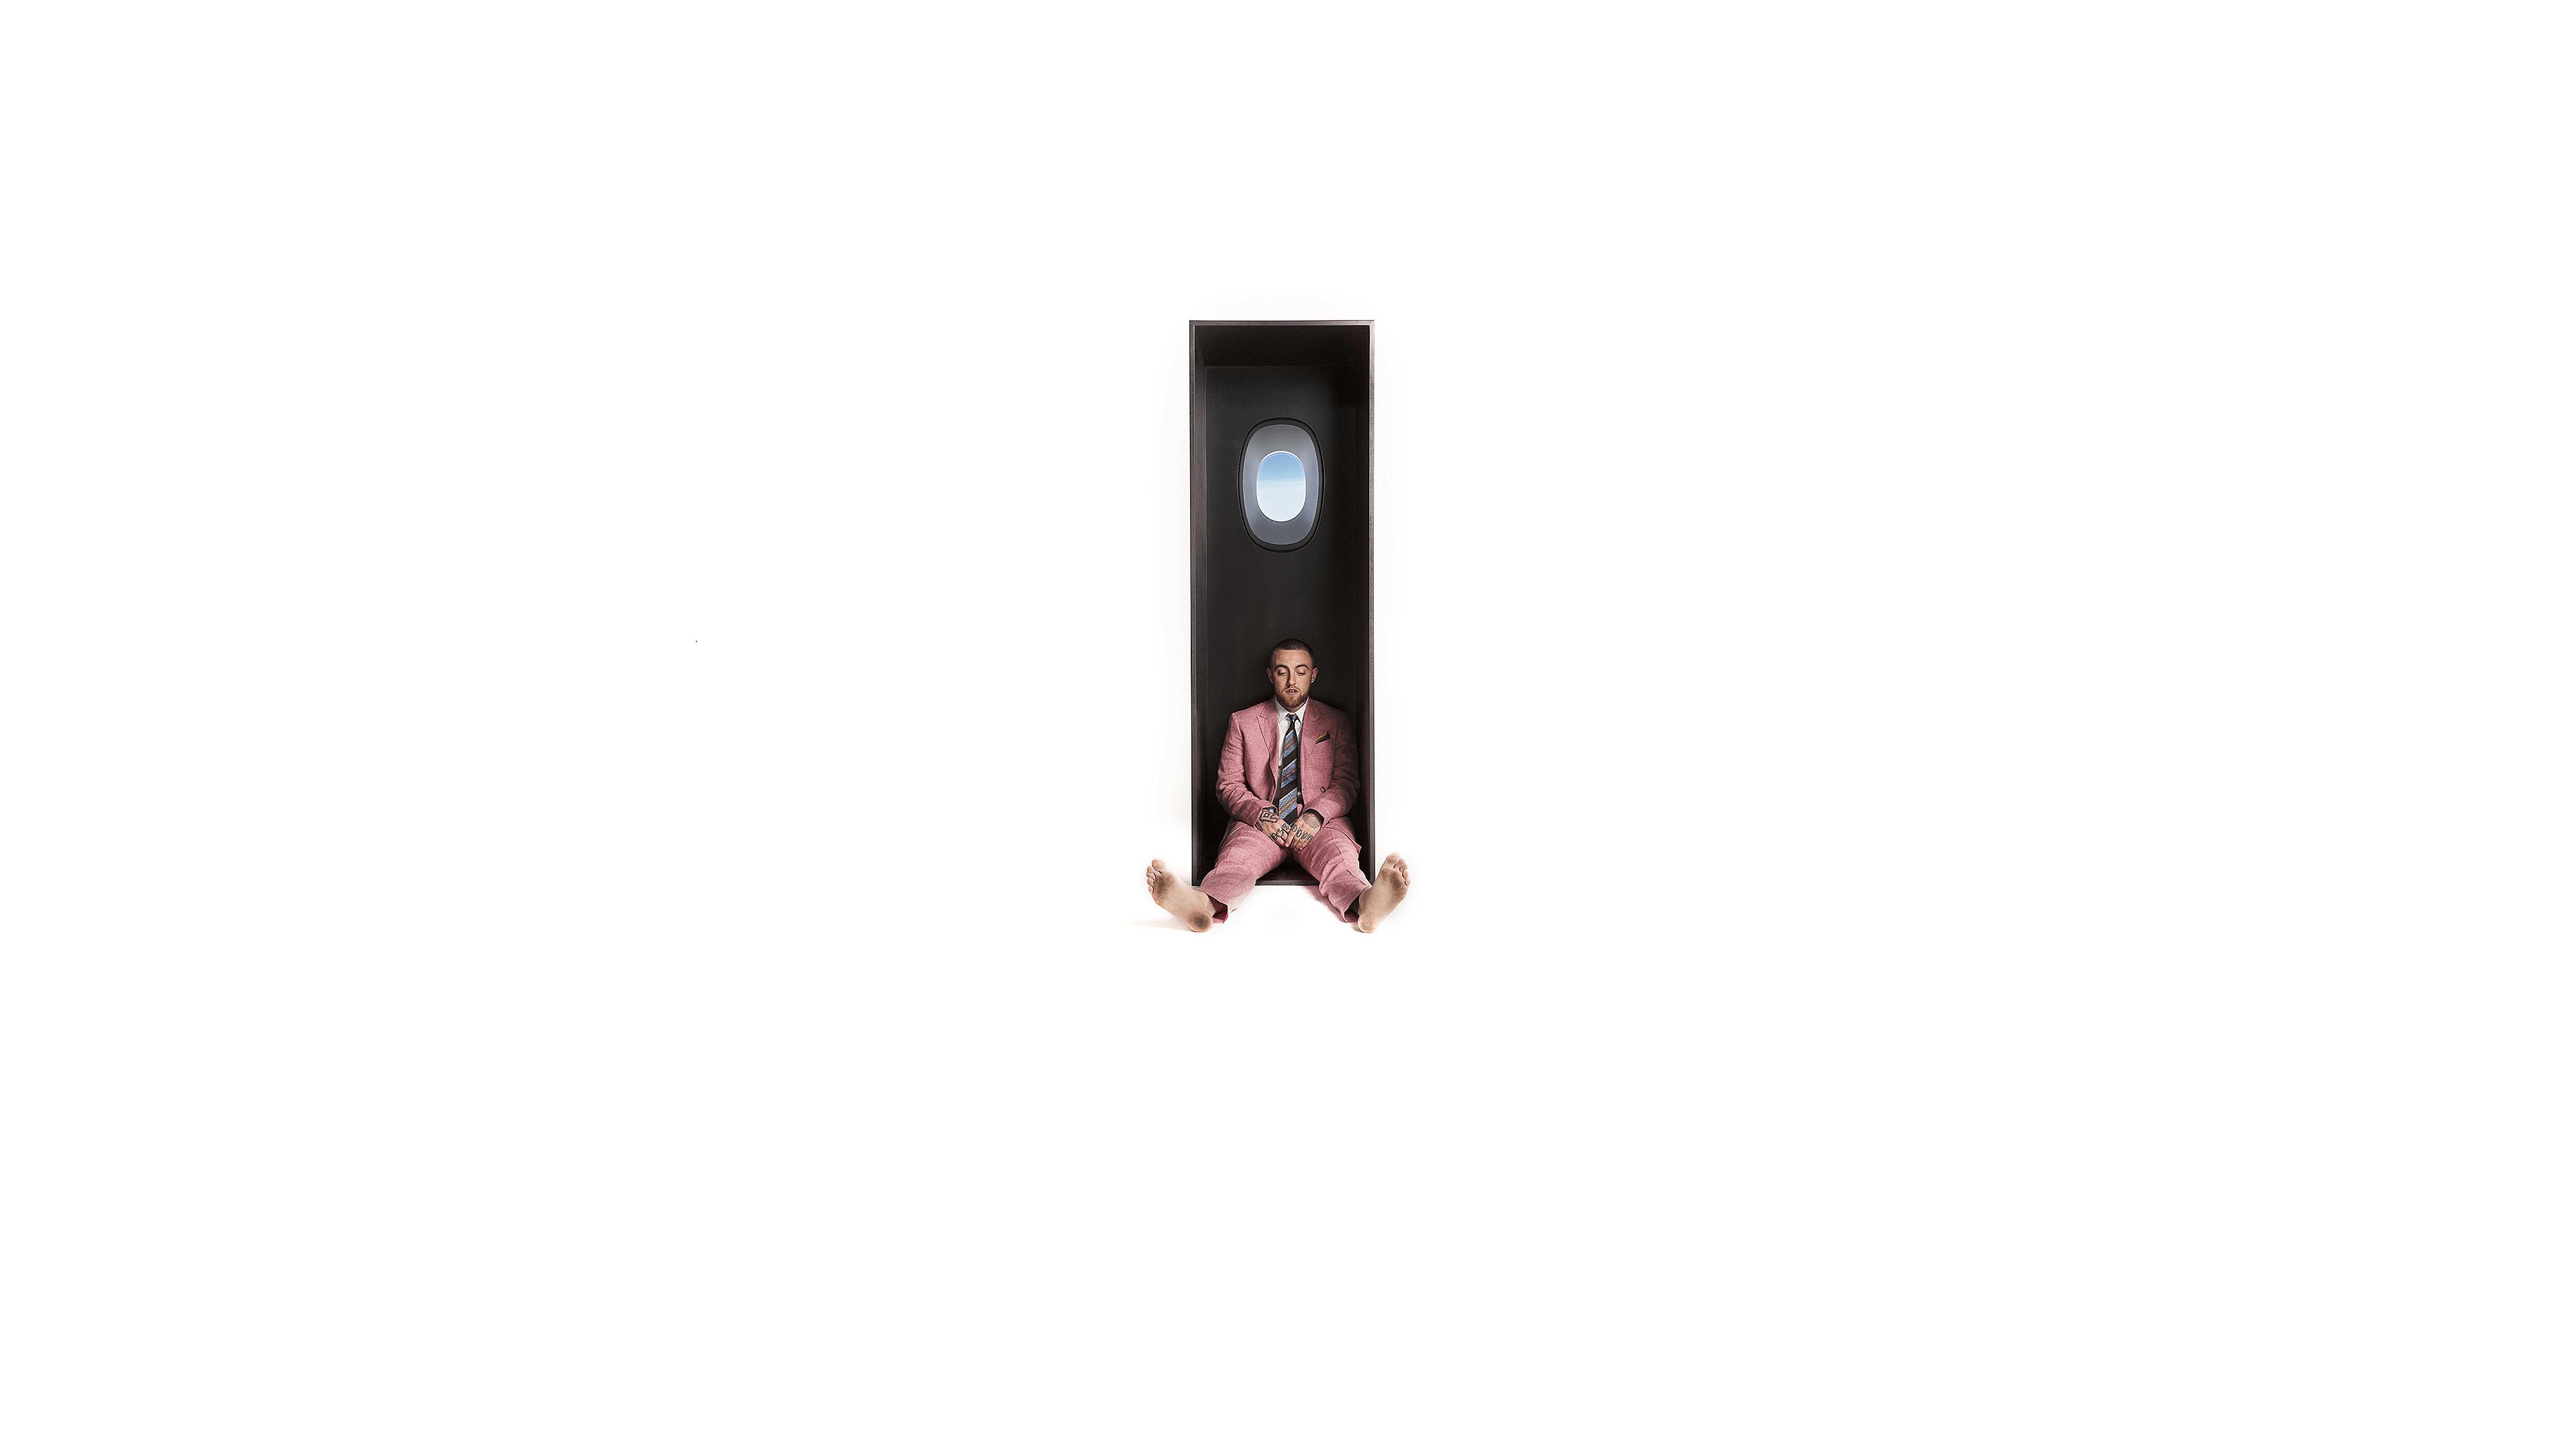 Mac Miller Computer Wallpapers - Wallpaper Cave